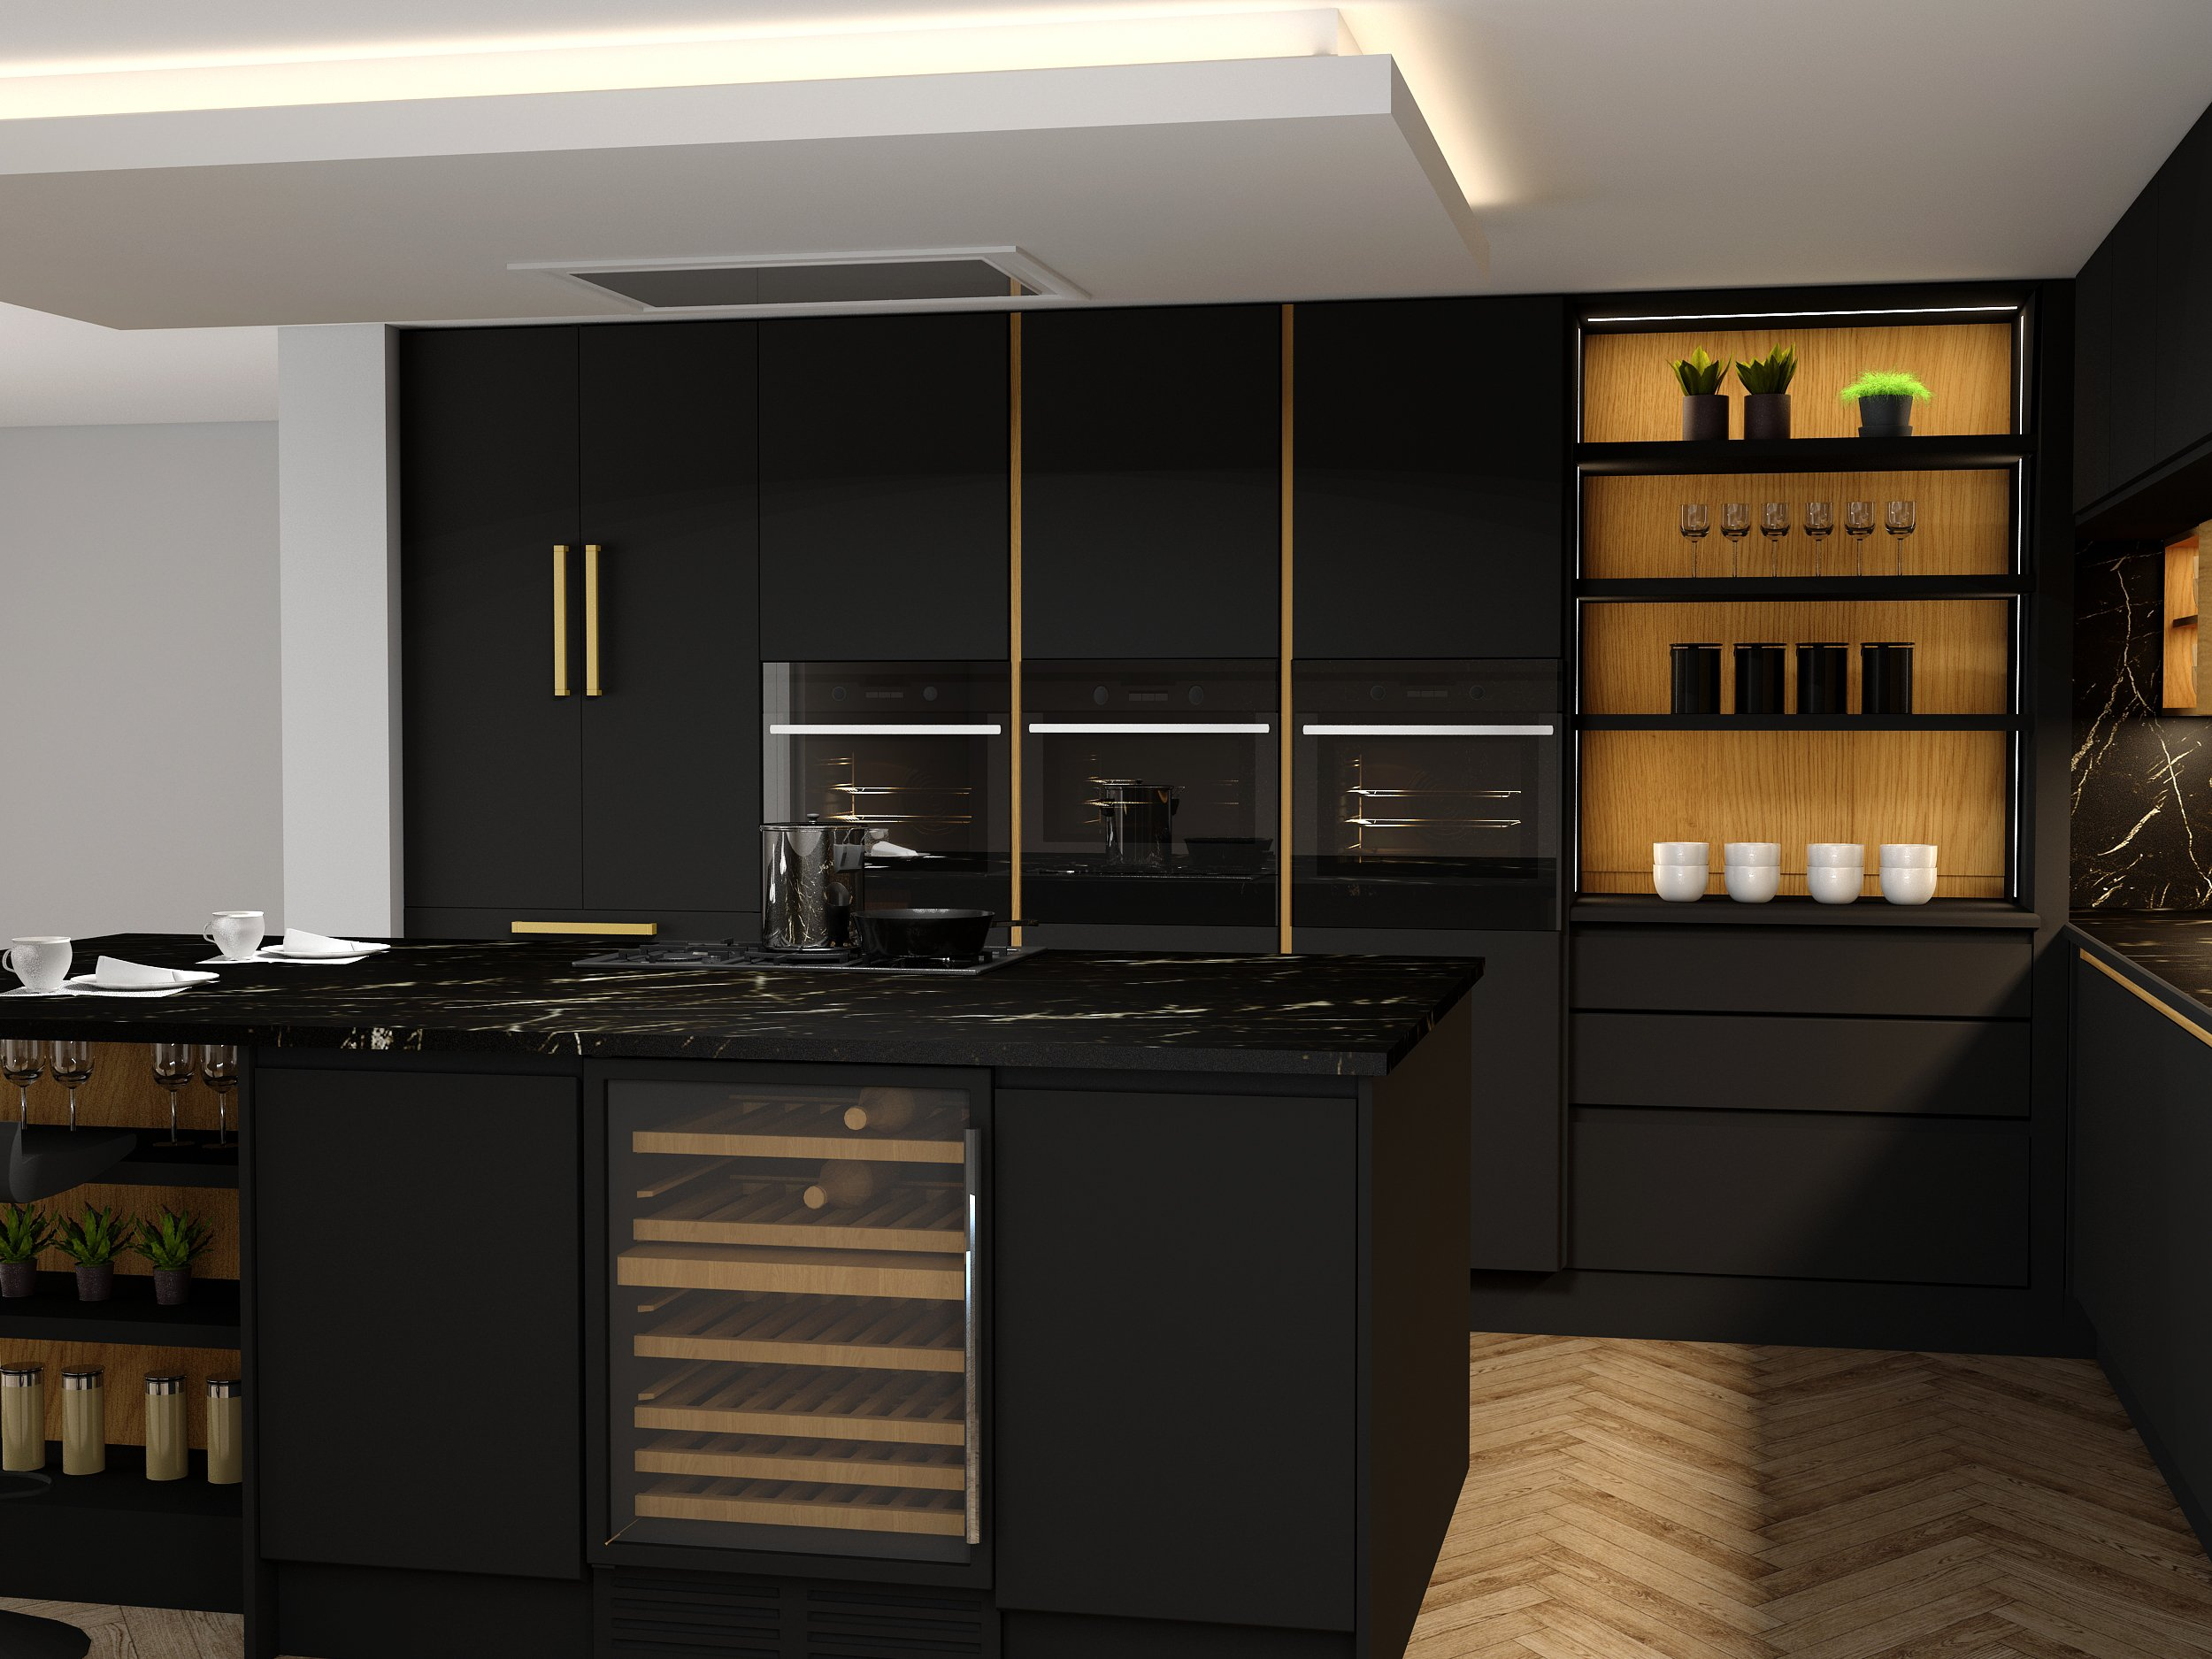 Handleless Kitchen with island in black matt and woodgrain finish